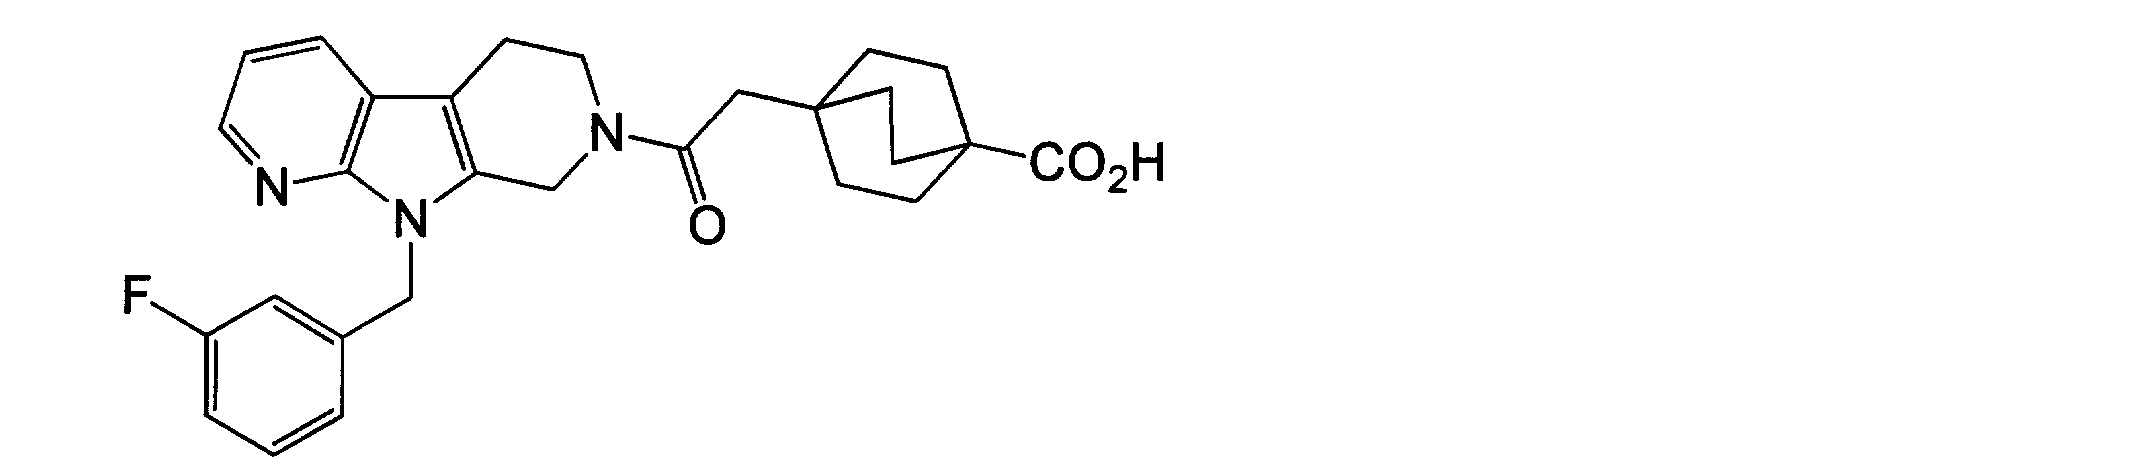 Figure JPOXMLDOC01-appb-C000090